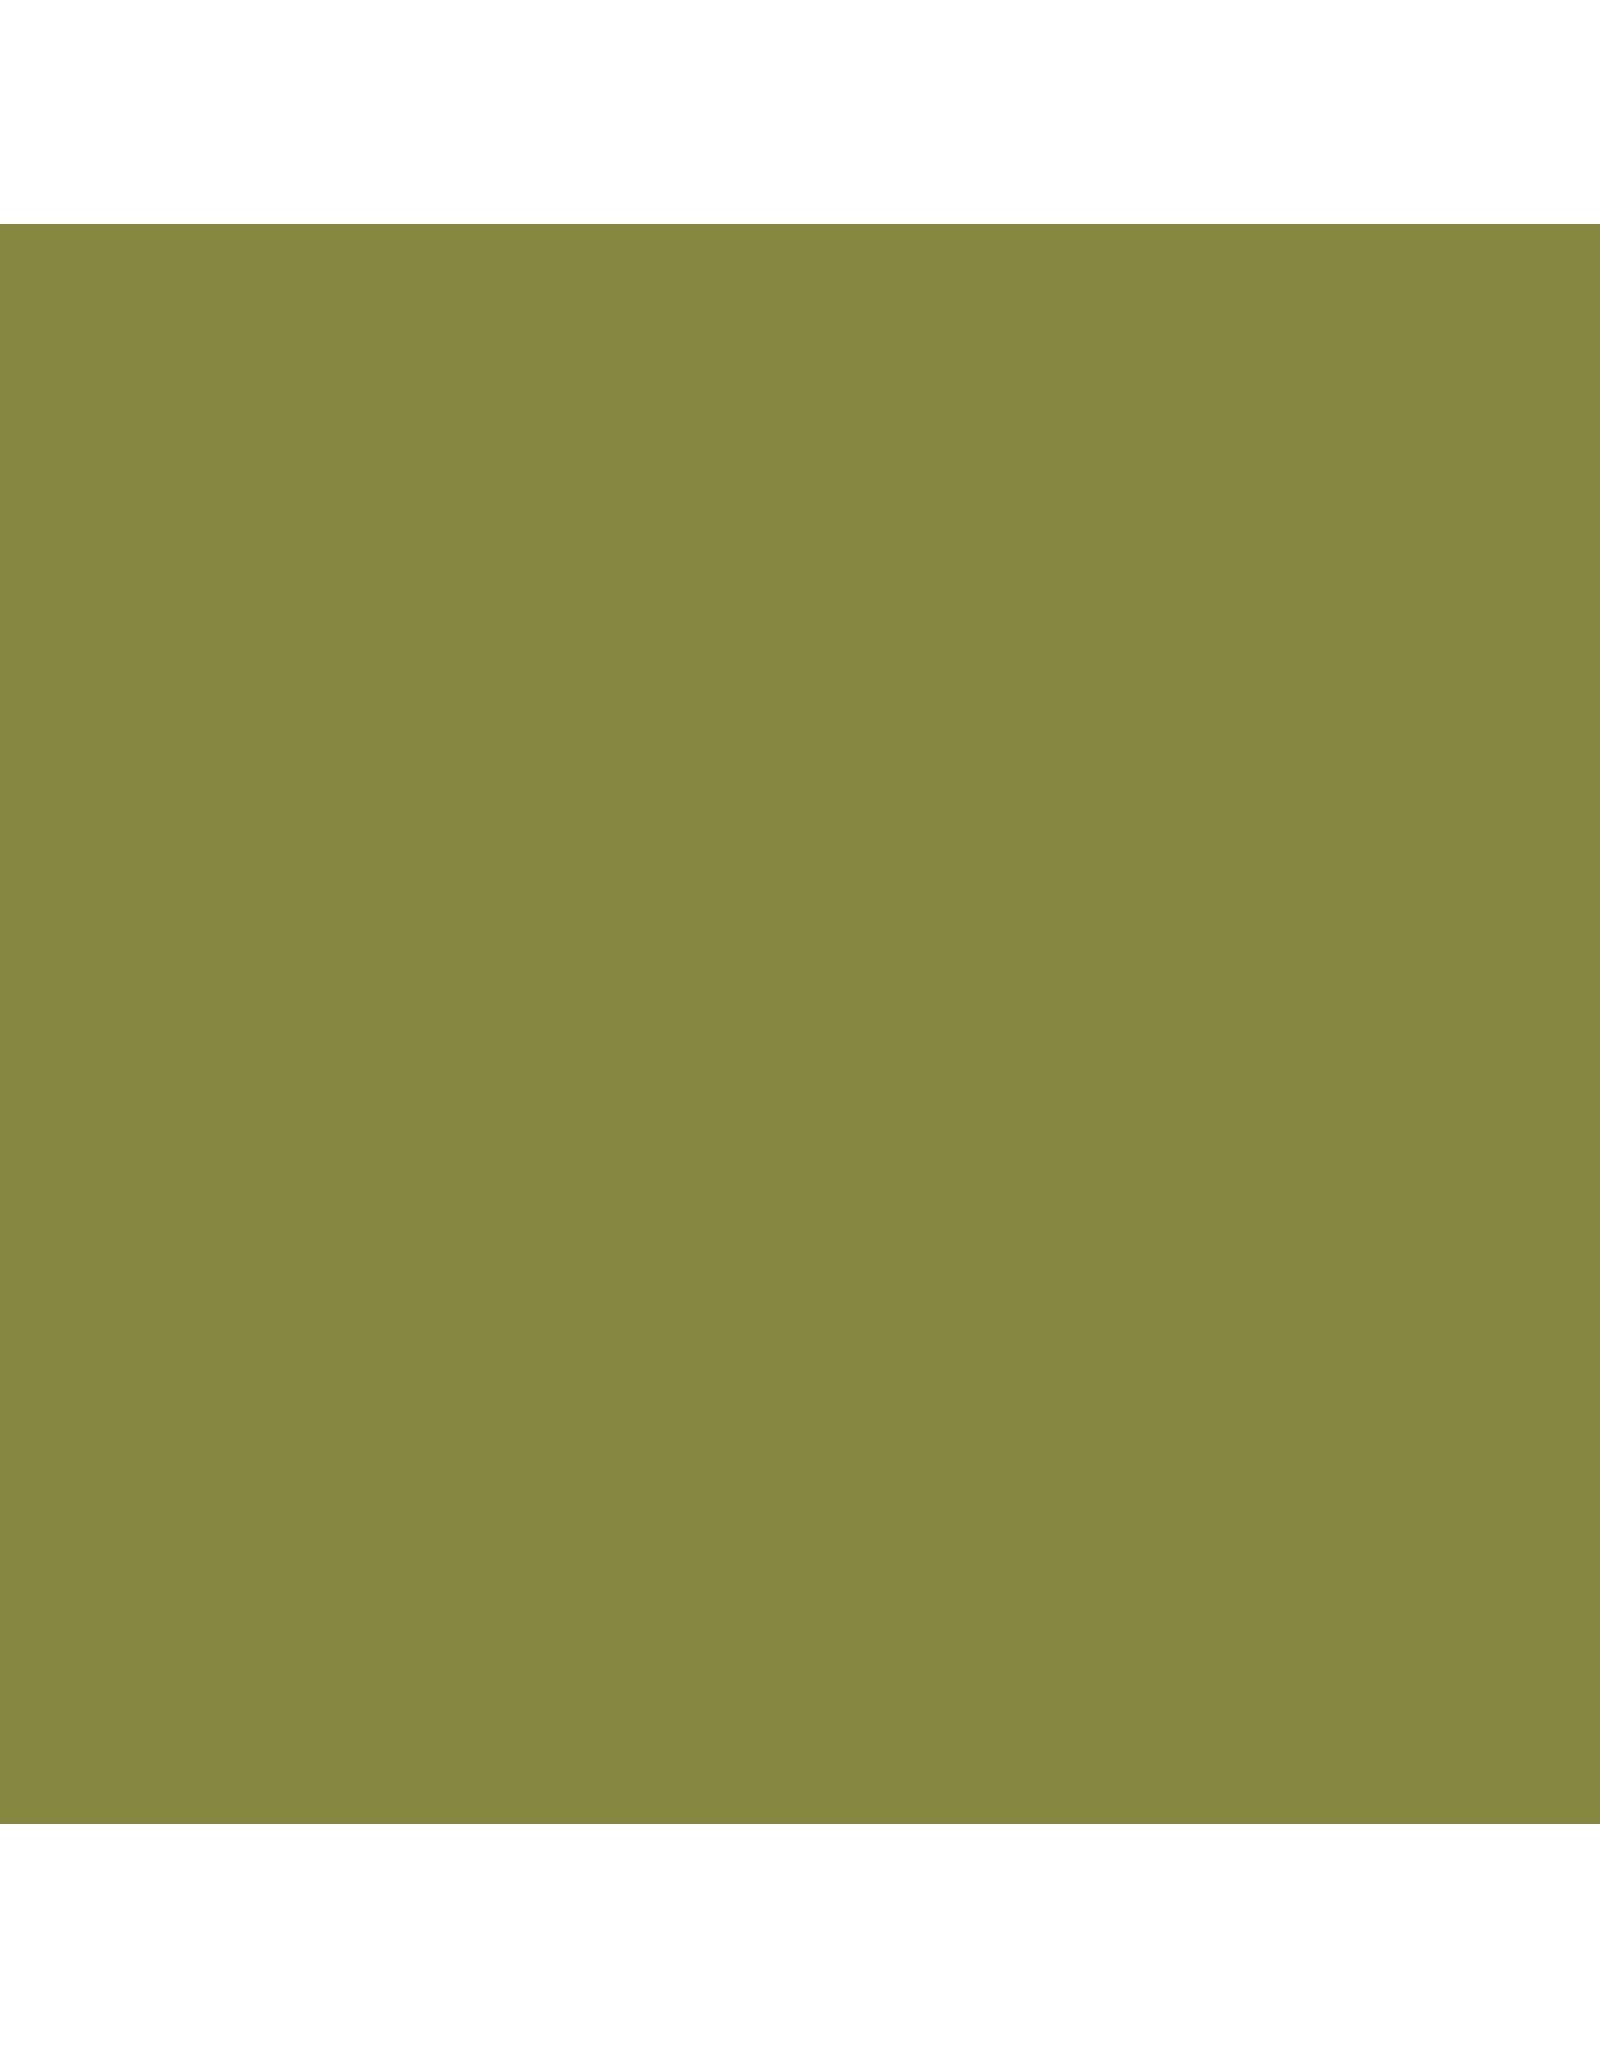 Andover Fabrics Century Solids, Jalapeno, Fabric Half-Yards